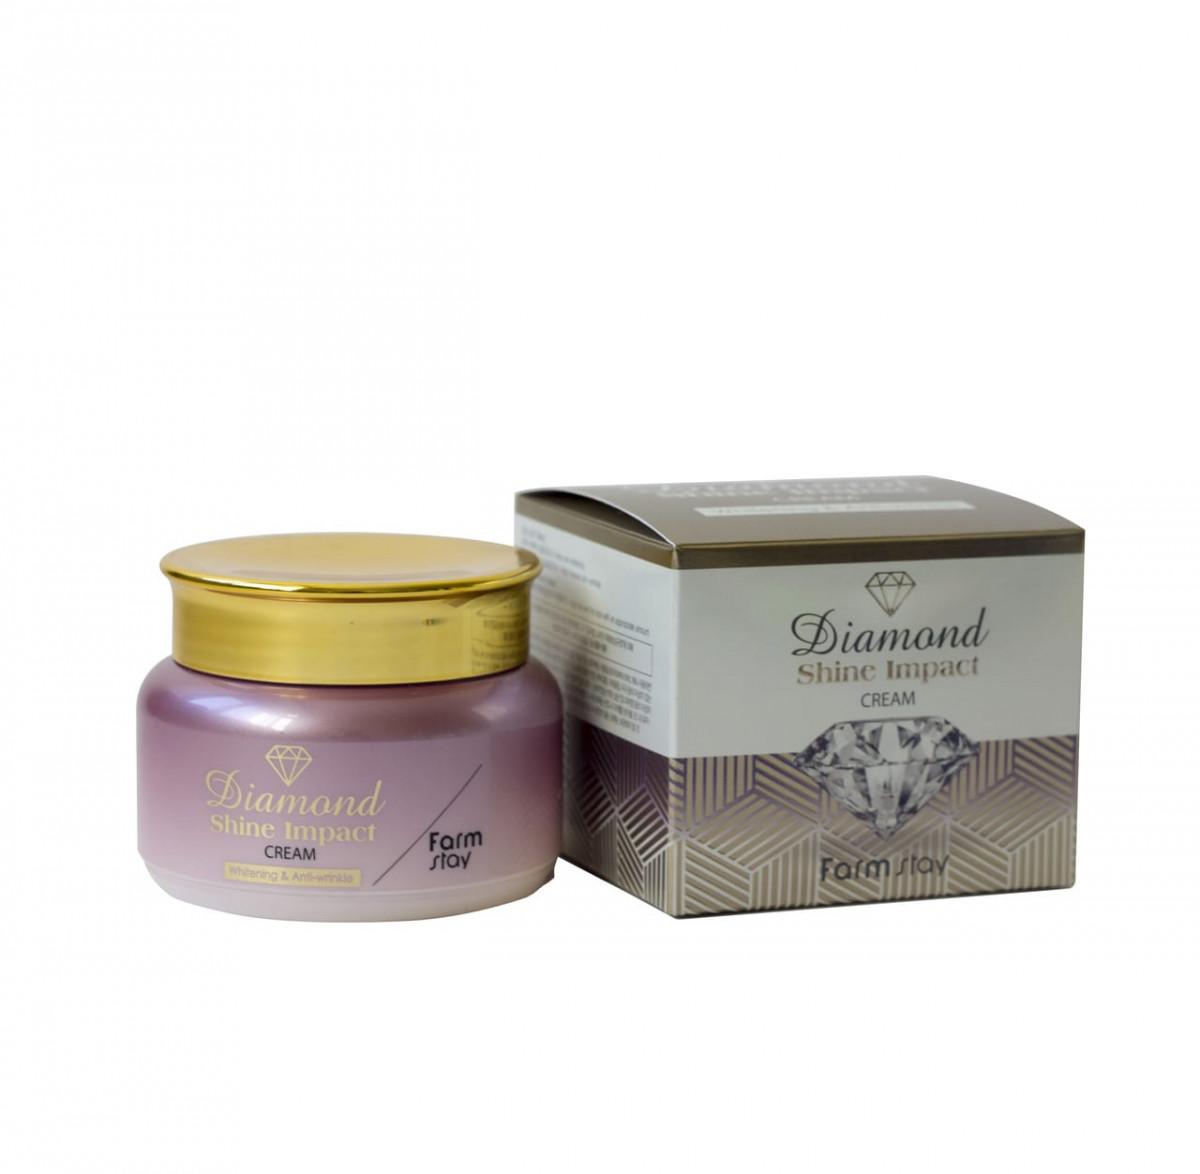 Diamond shine Impact Cream [FarmStay]